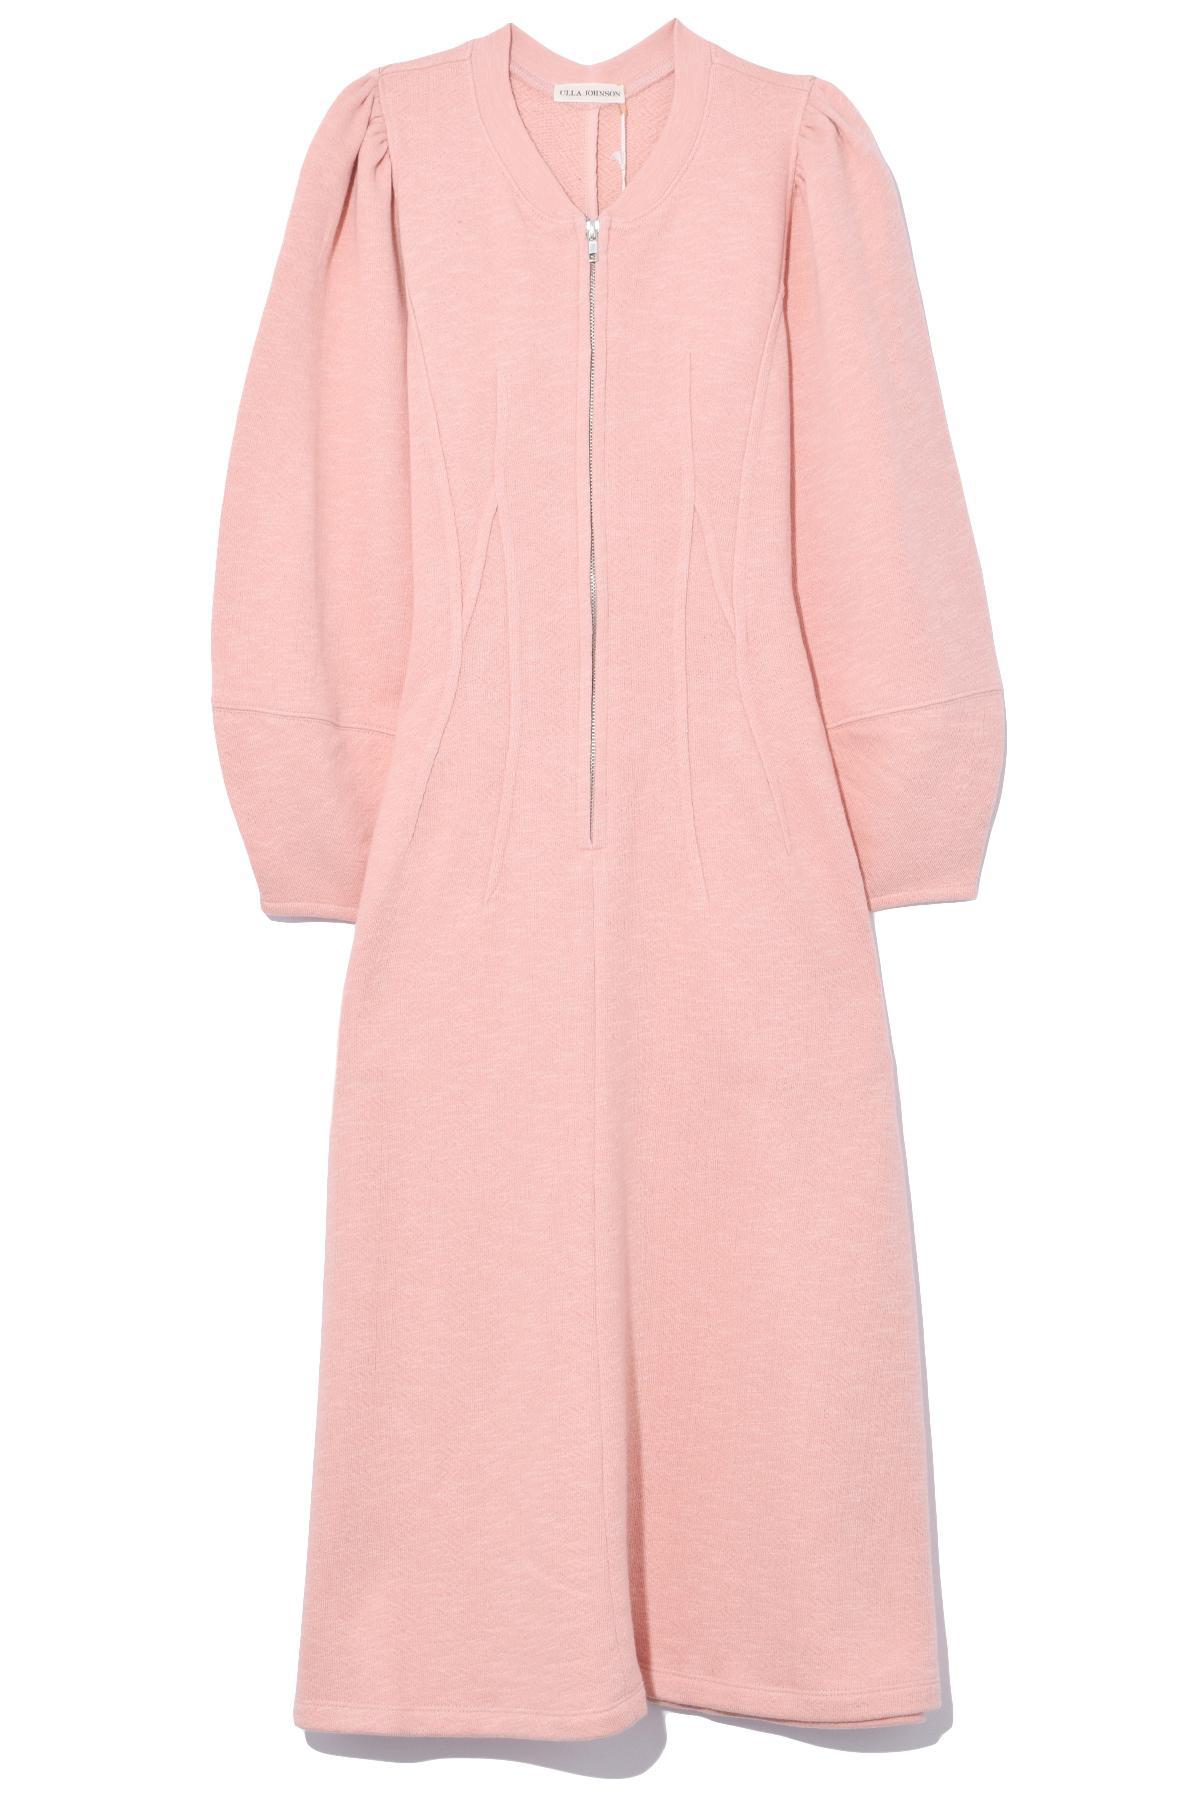 963ab01f3668 Lyst - Ulla Johnson Elora Dress In Rose in Pink